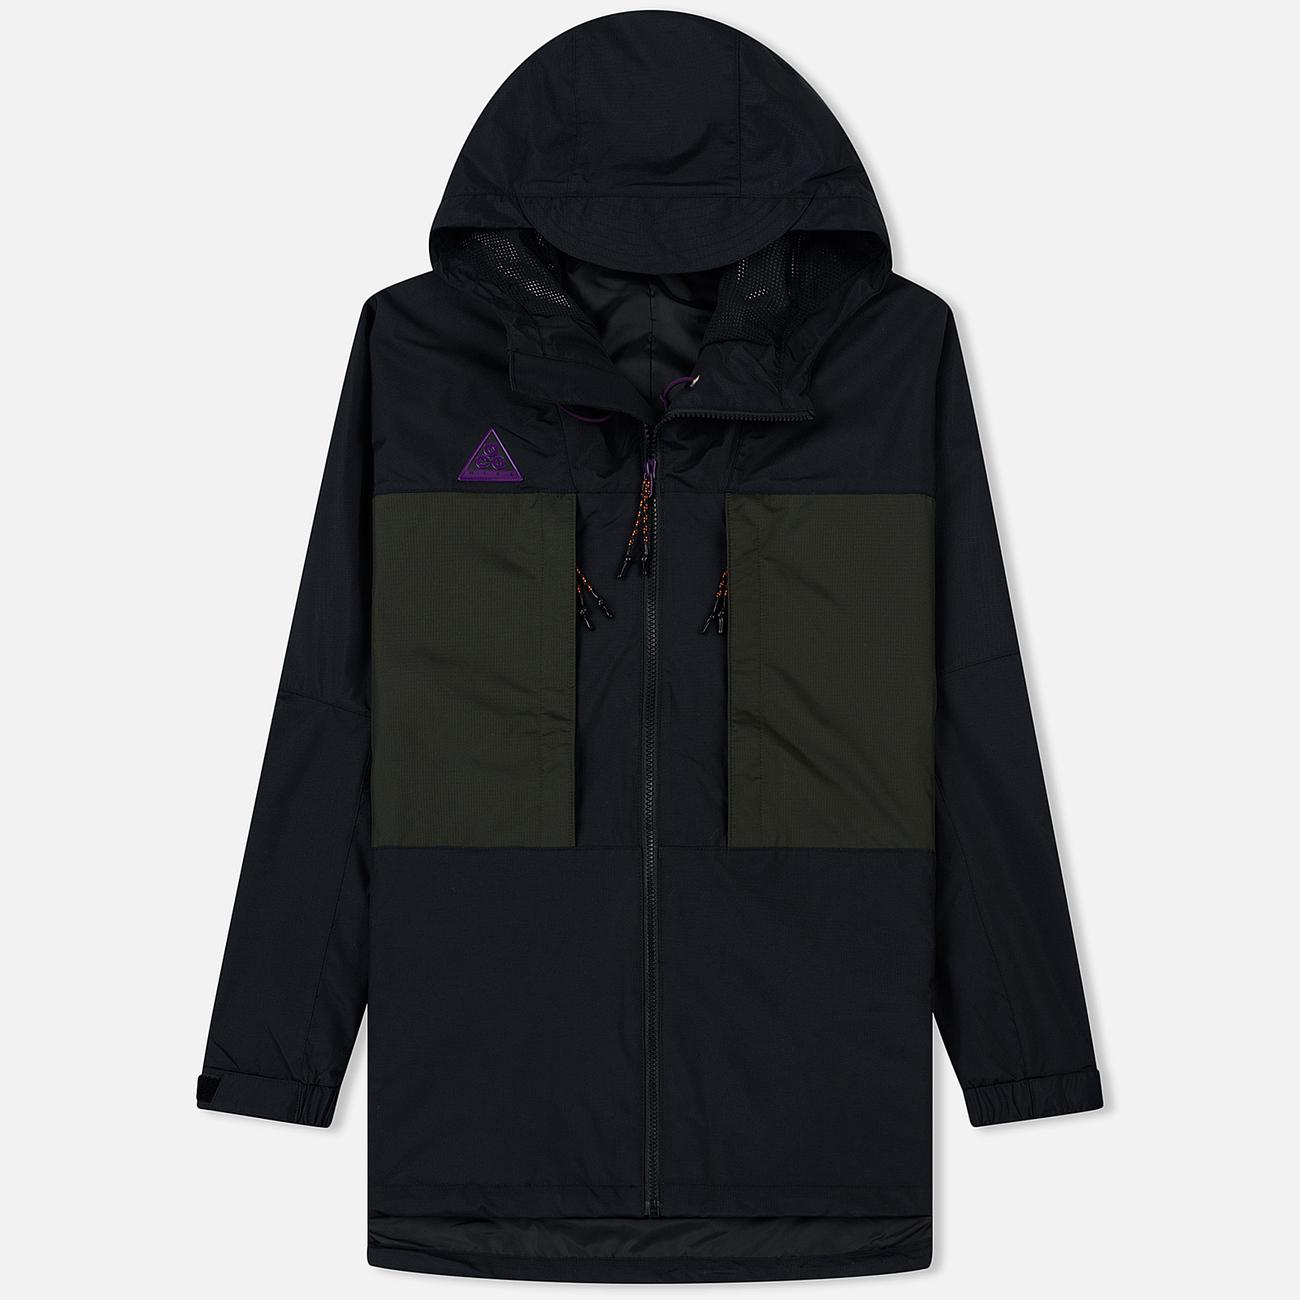 Мужская куртка ветровка Nike ACG Black/Sequoia/Black